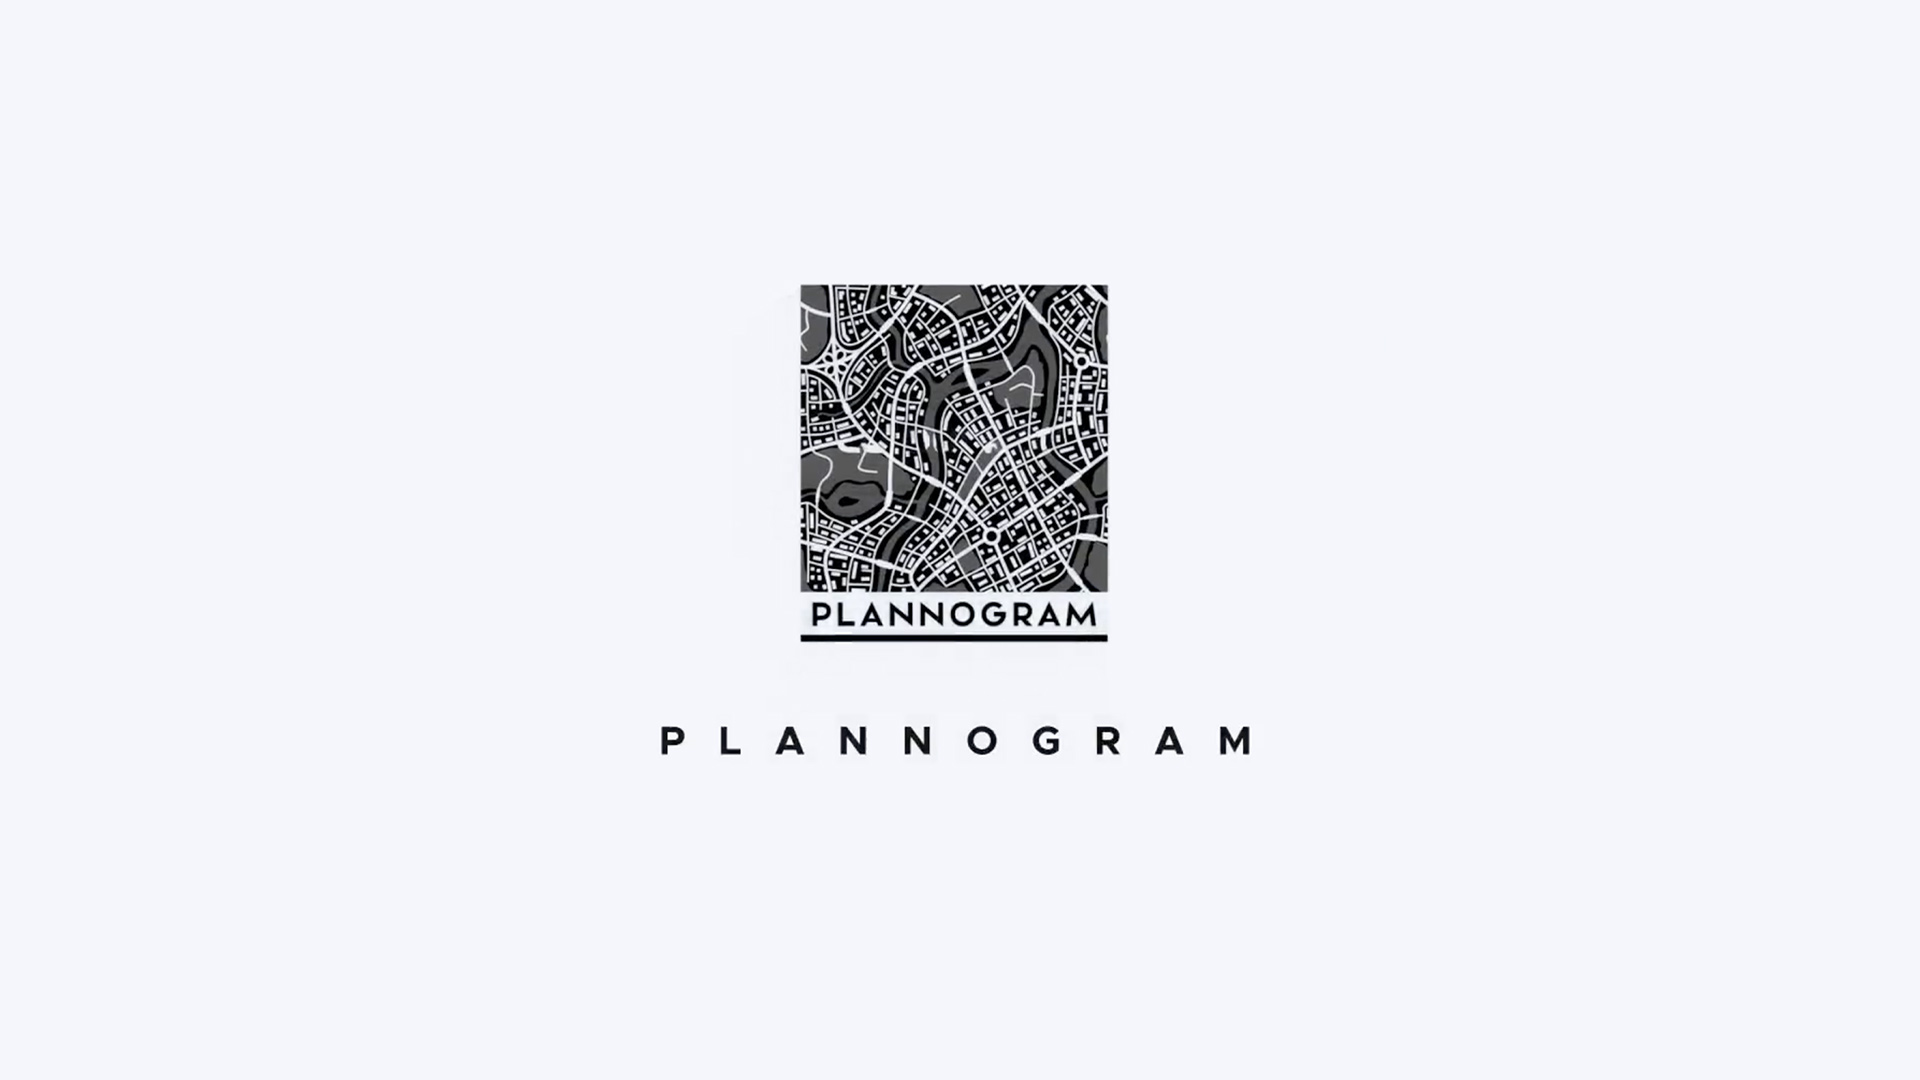 23 février 2021 – Plannogram – India